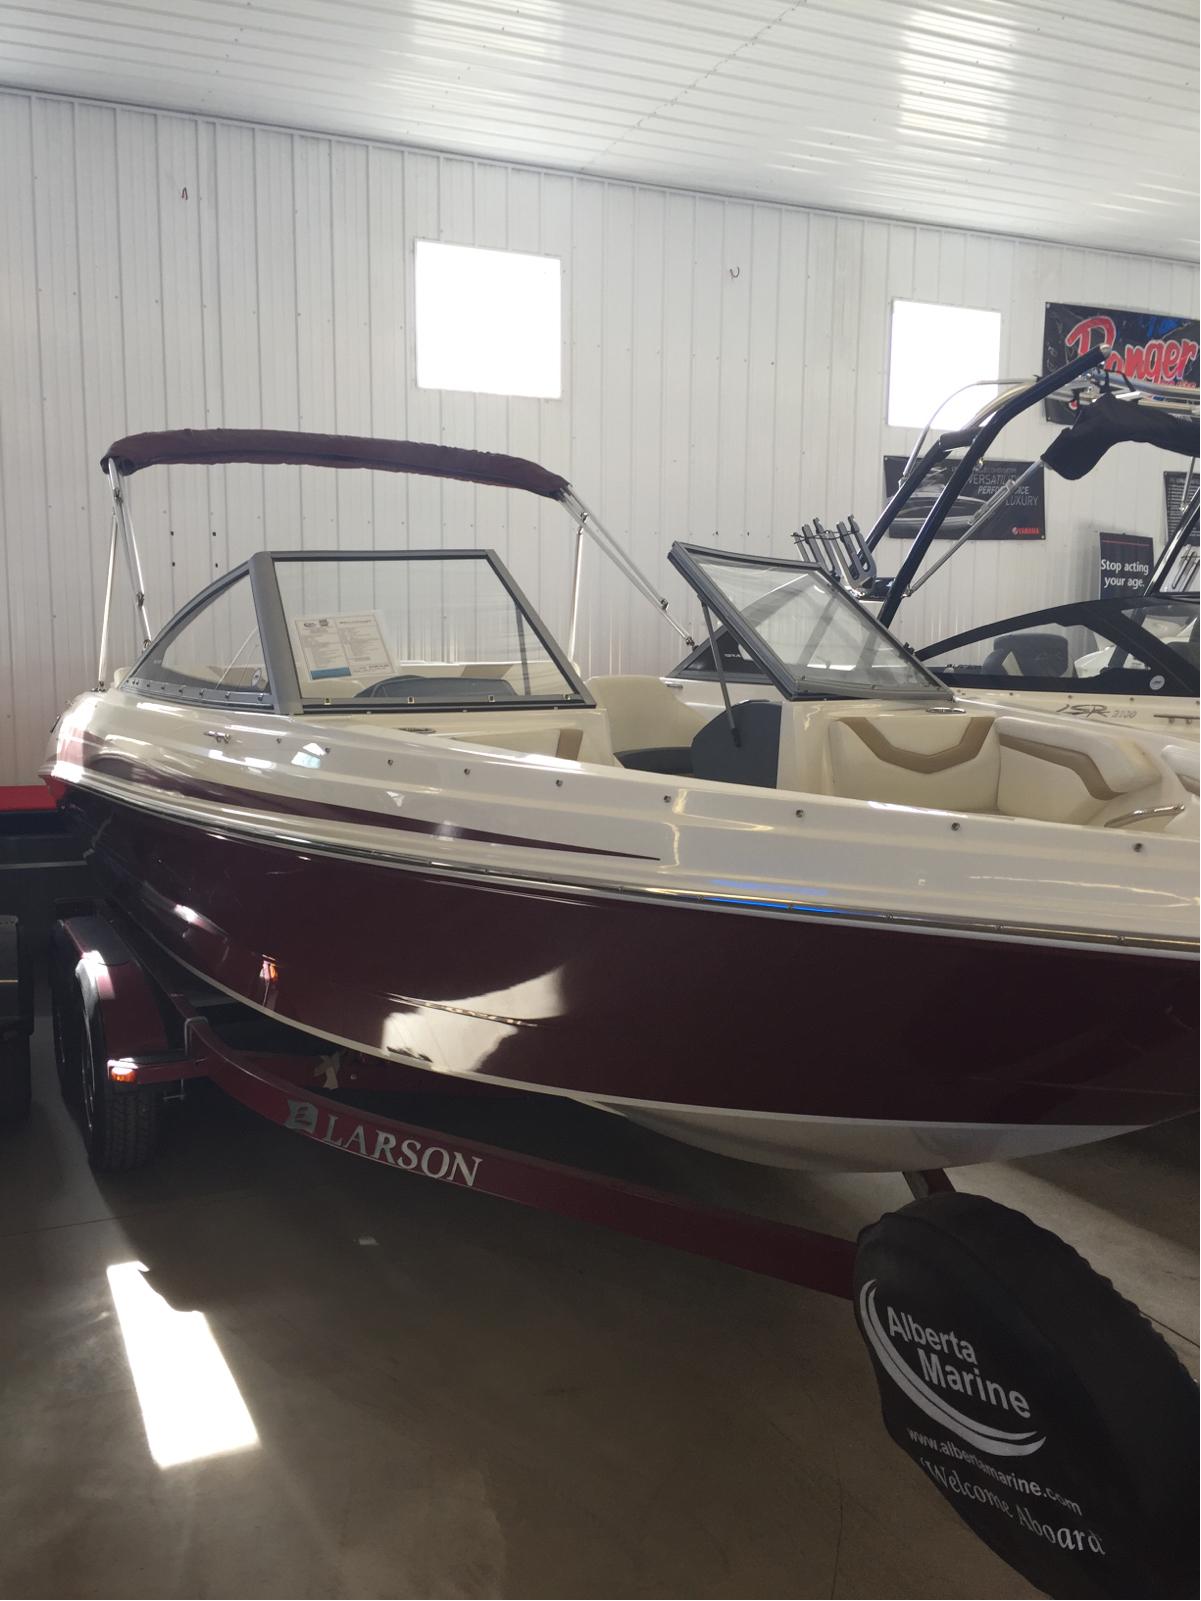 Larson LX 2150